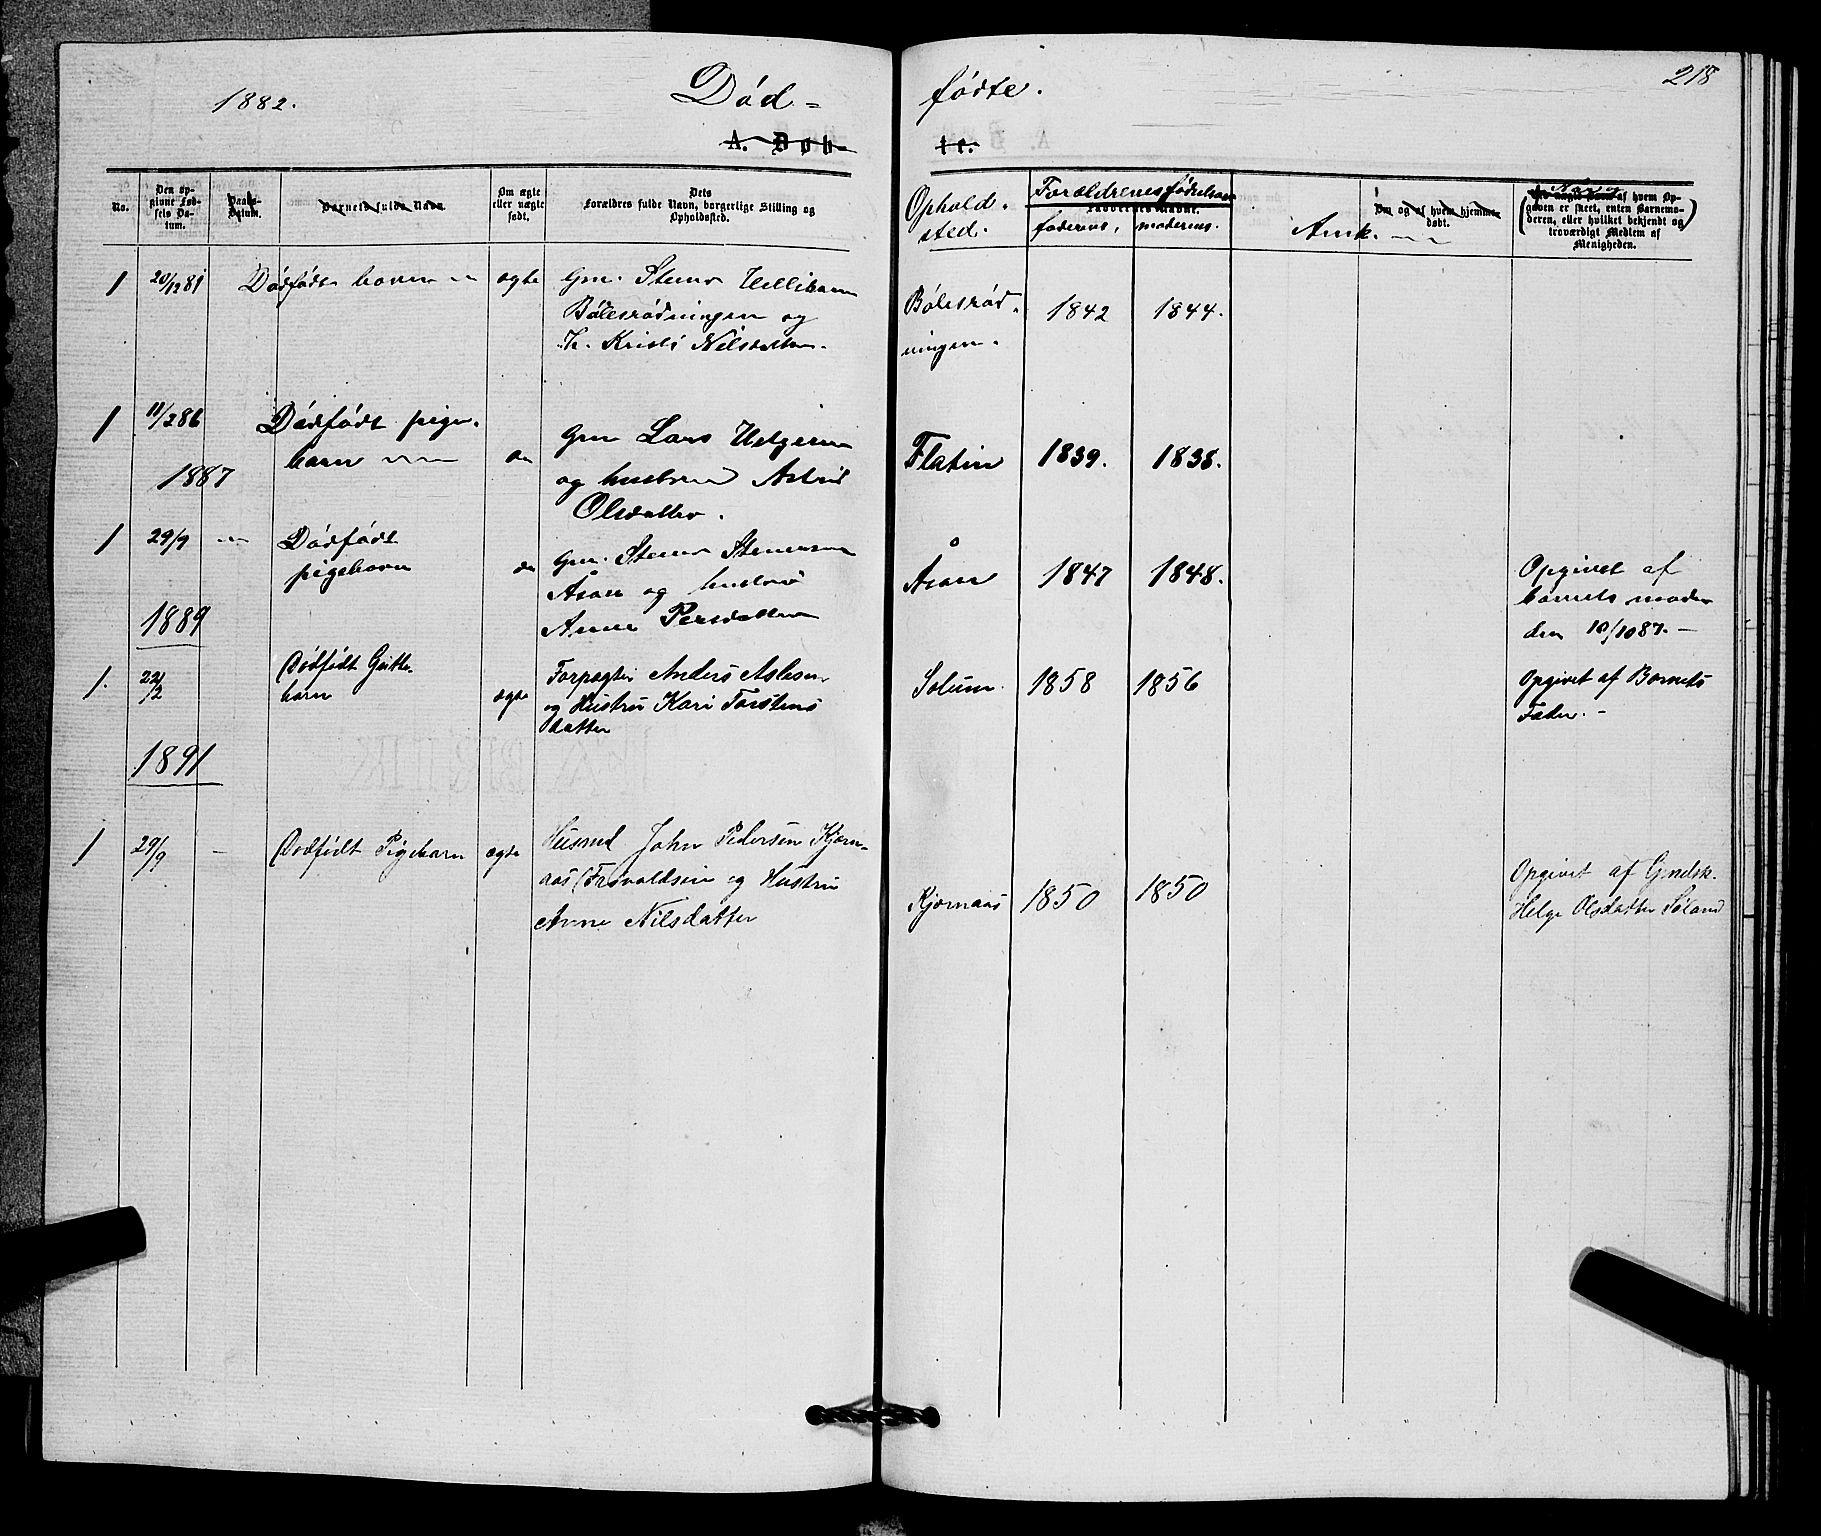 SAKO, Sigdal kirkebøker, G/Gb/L0002: Klokkerbok nr. II 2, 1875-1900, s. 218